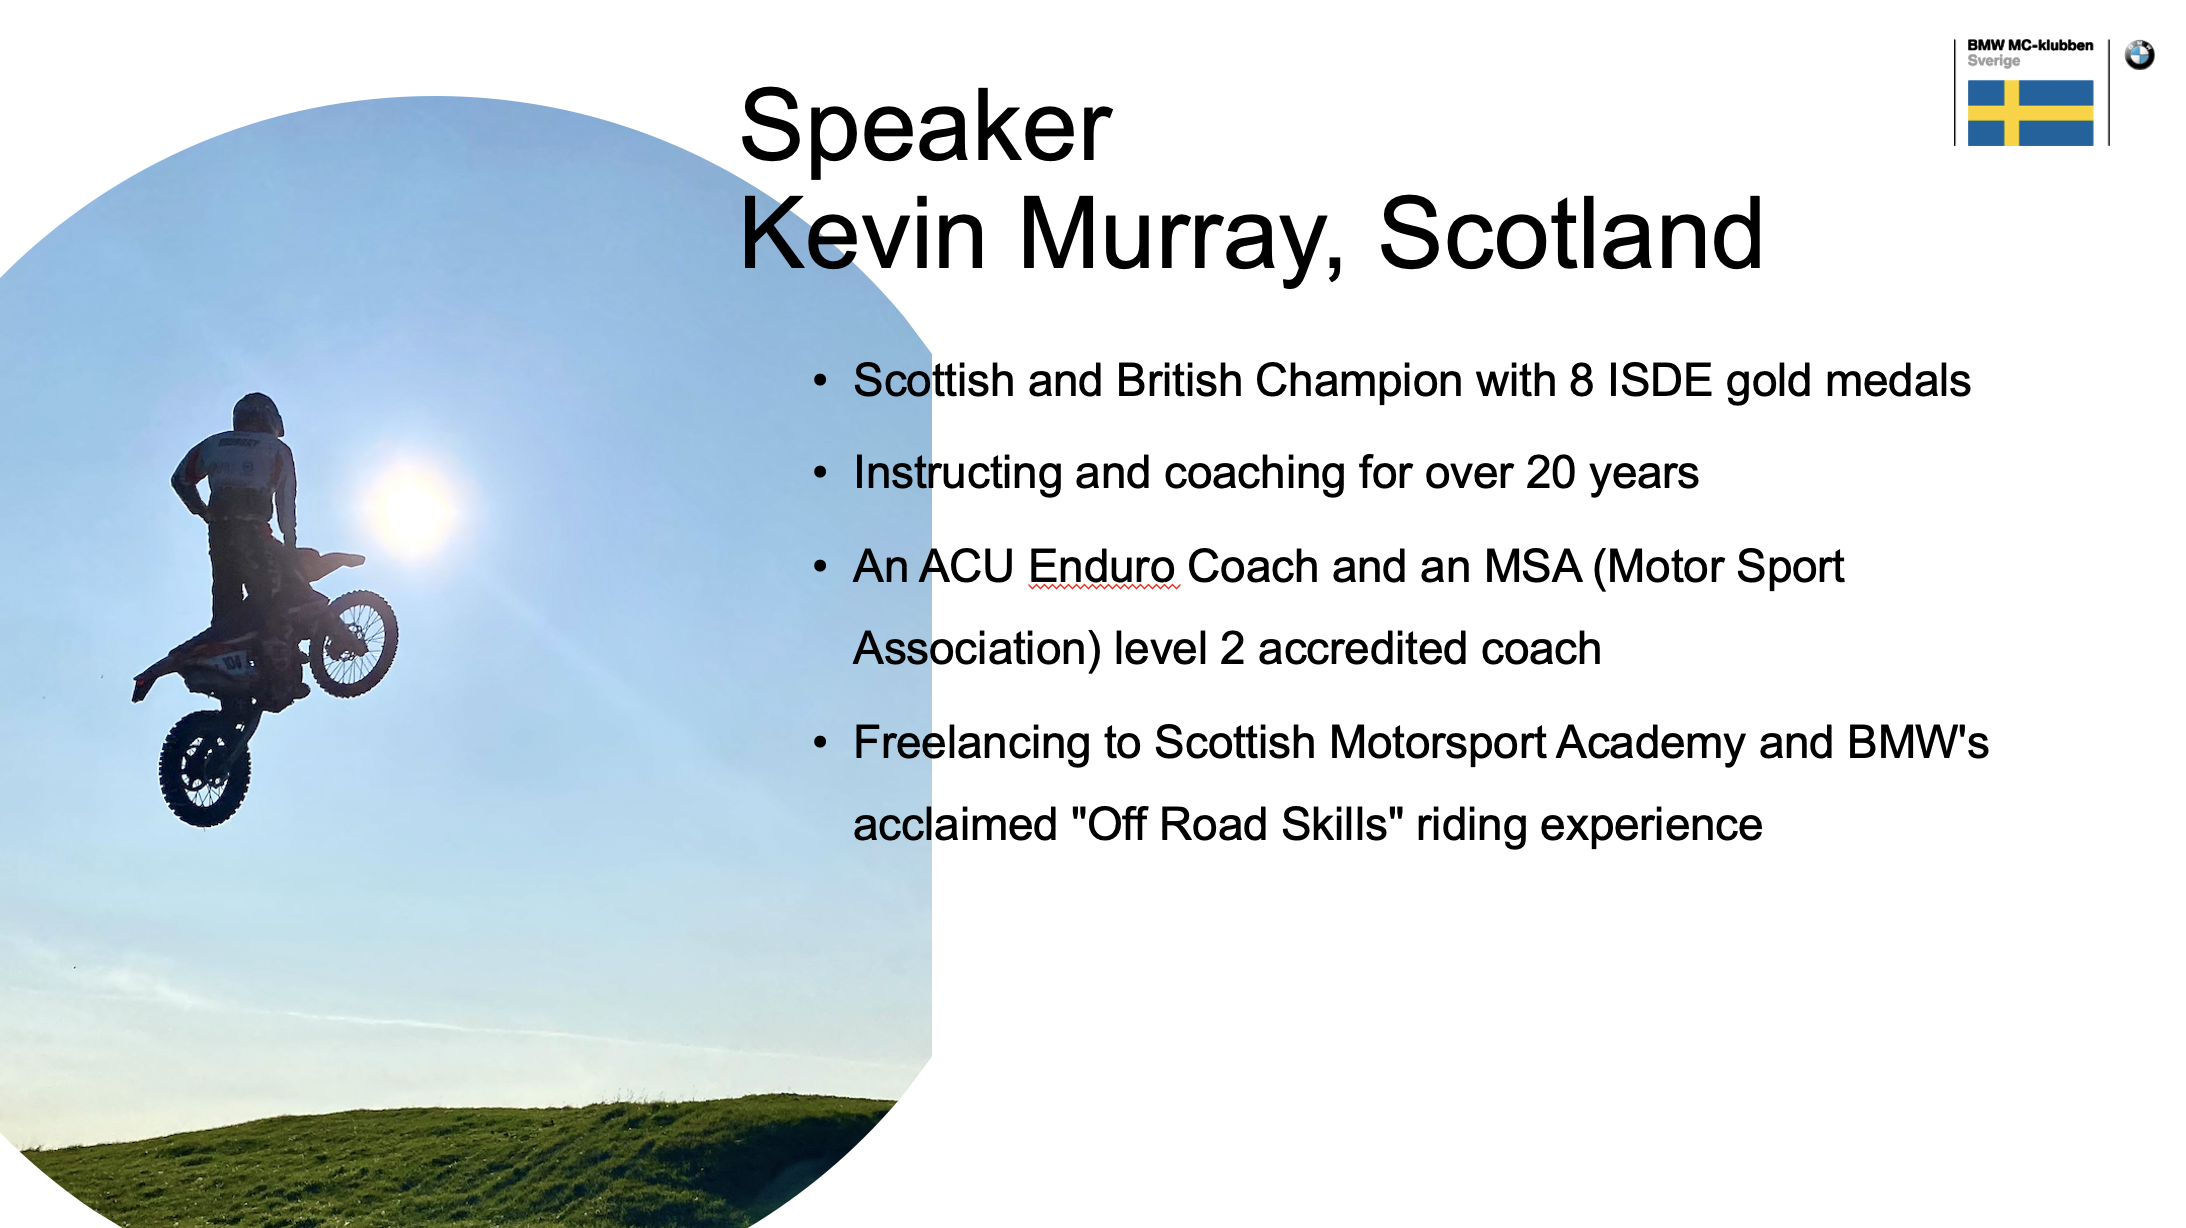 Kevin Murray, Scotland